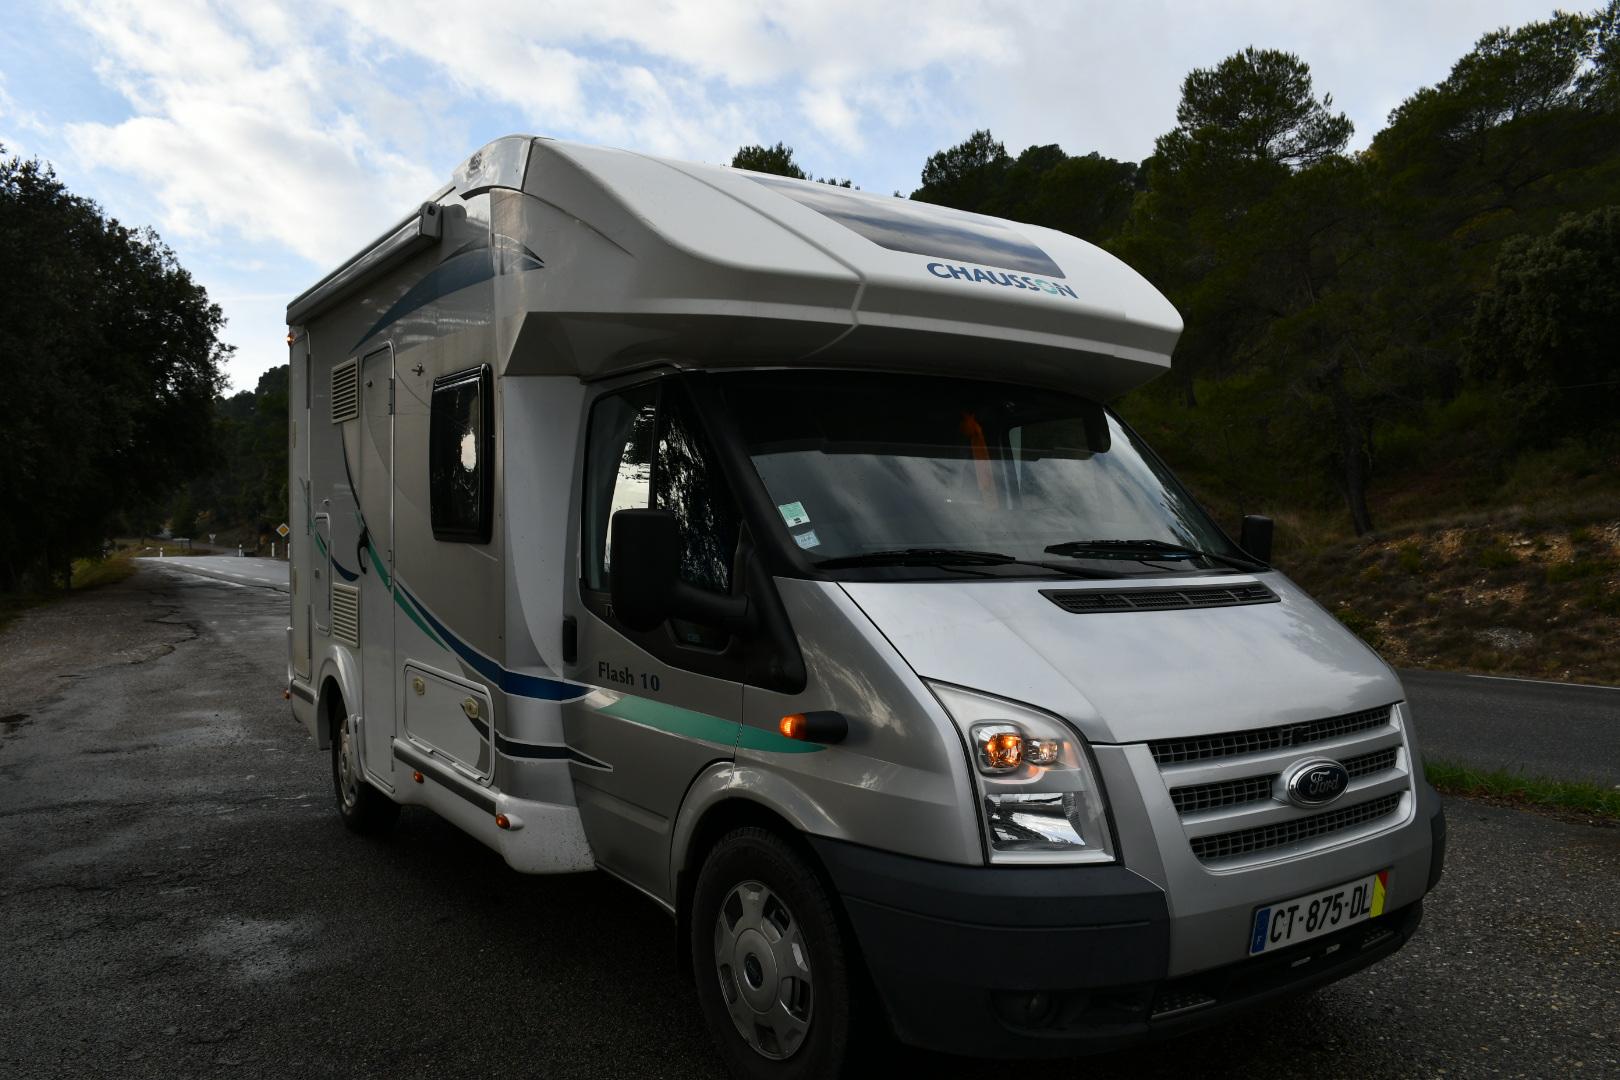 Camping car profilé Chausson Flash 10